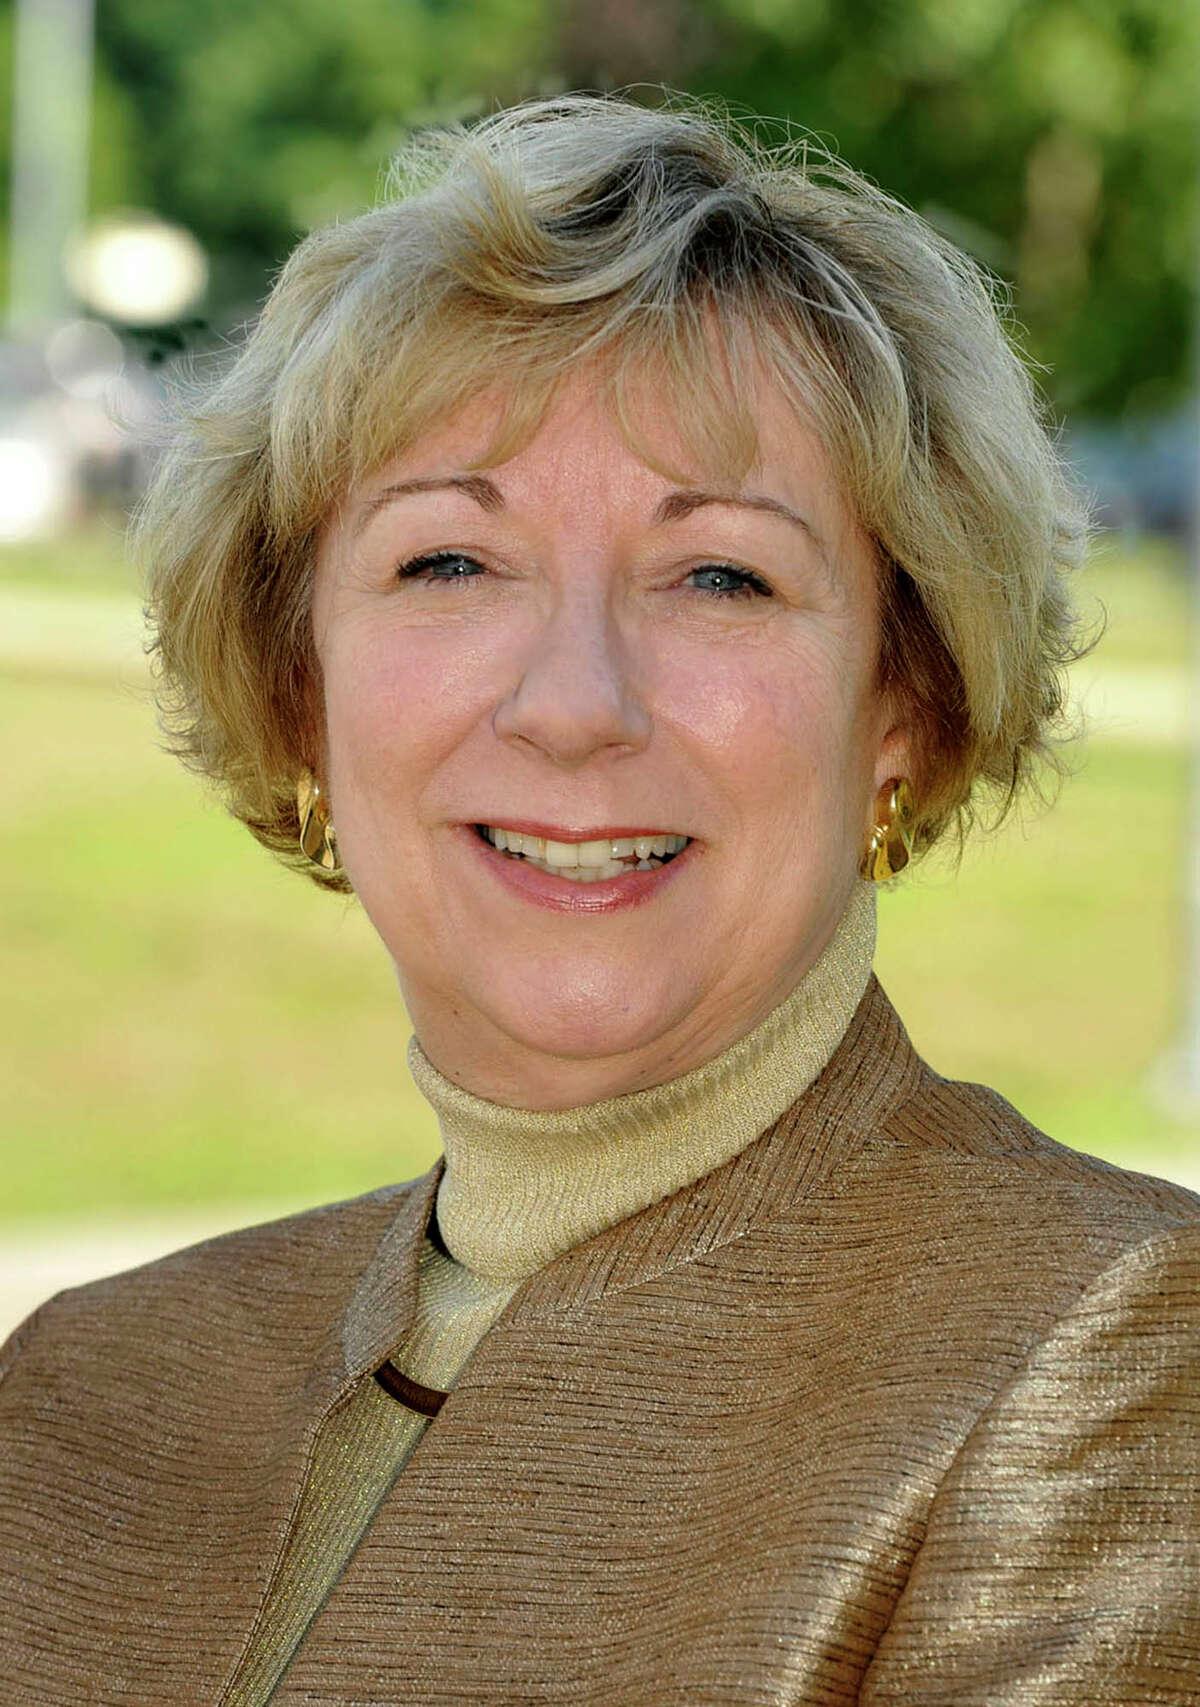 JeanAnn Paddyfote, New Milford School's superintendent